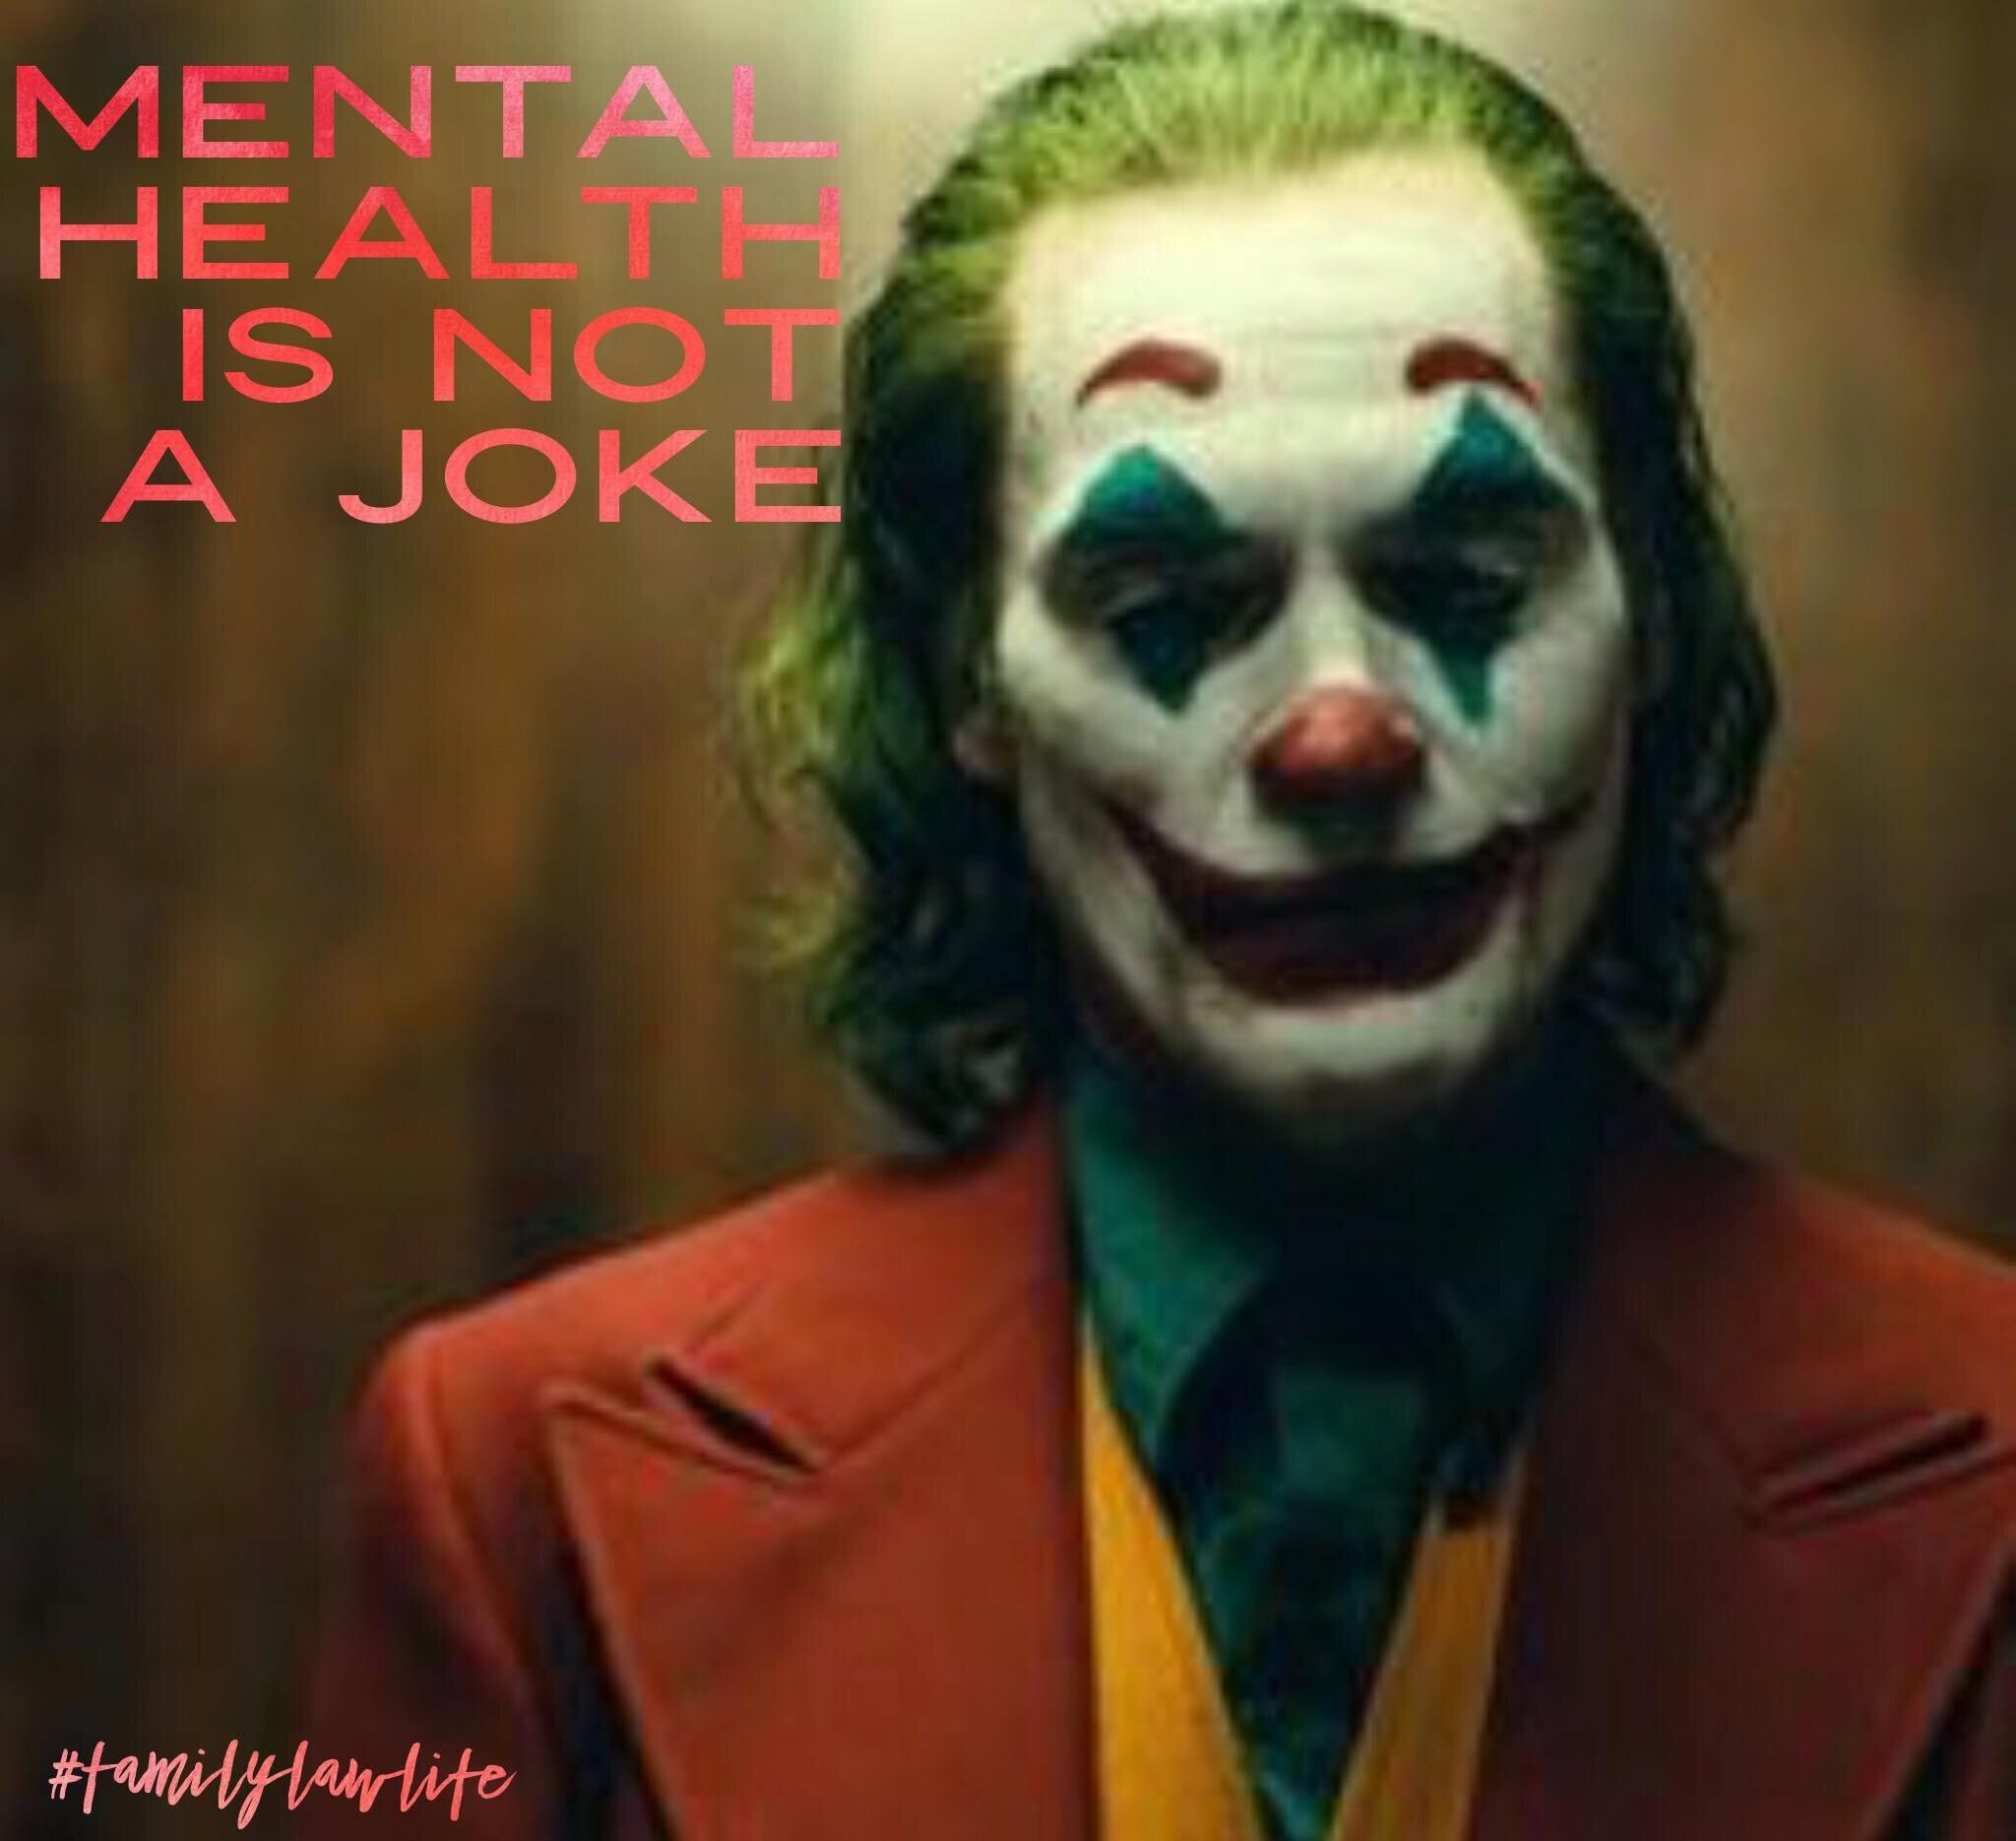 image for mental health blog.jpg